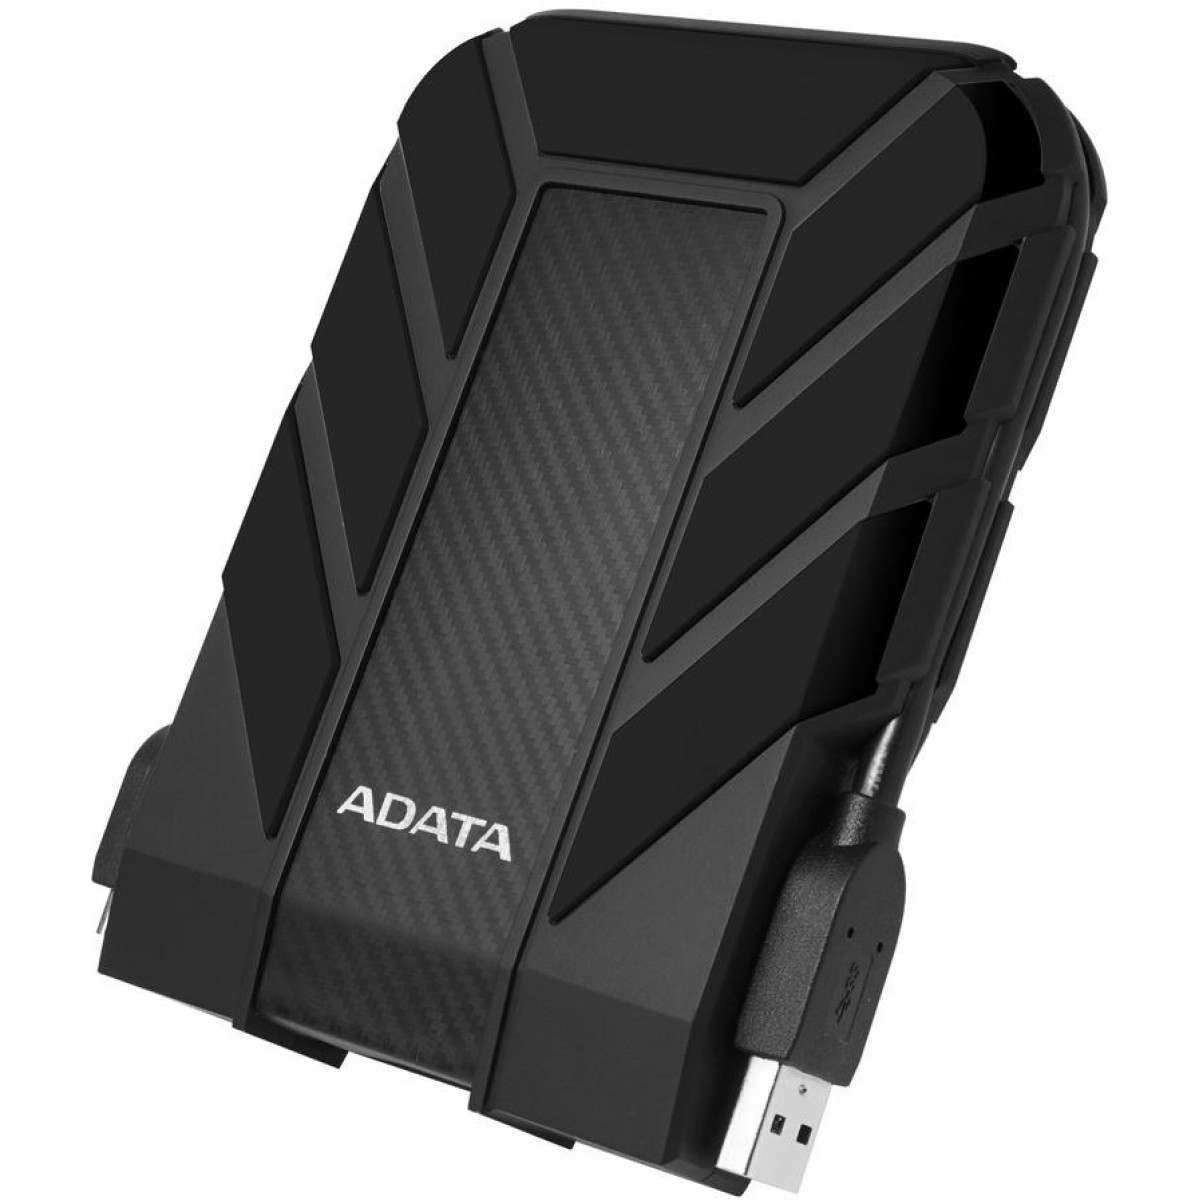 HD Externo Portátil Adata HD710 Pro 2TB, USB 3.2, Black, AHD710P-2TU31-CBK